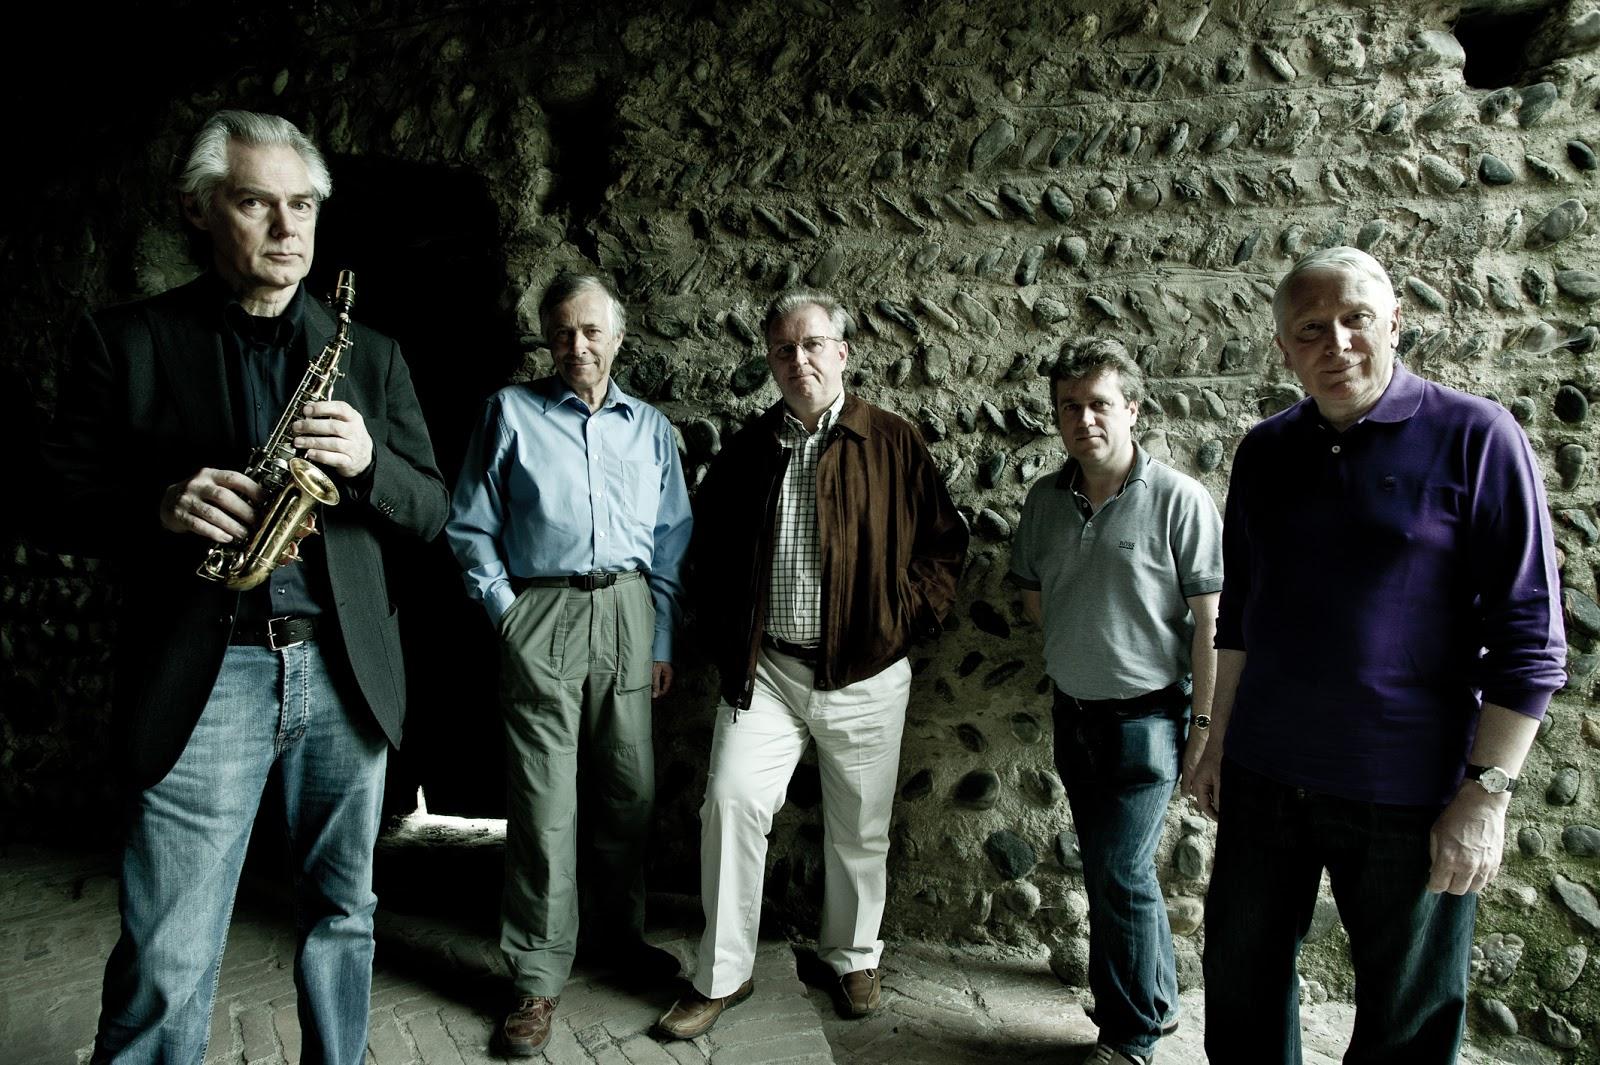 Jan Garbarek si Hilliard Ensemble - Officium